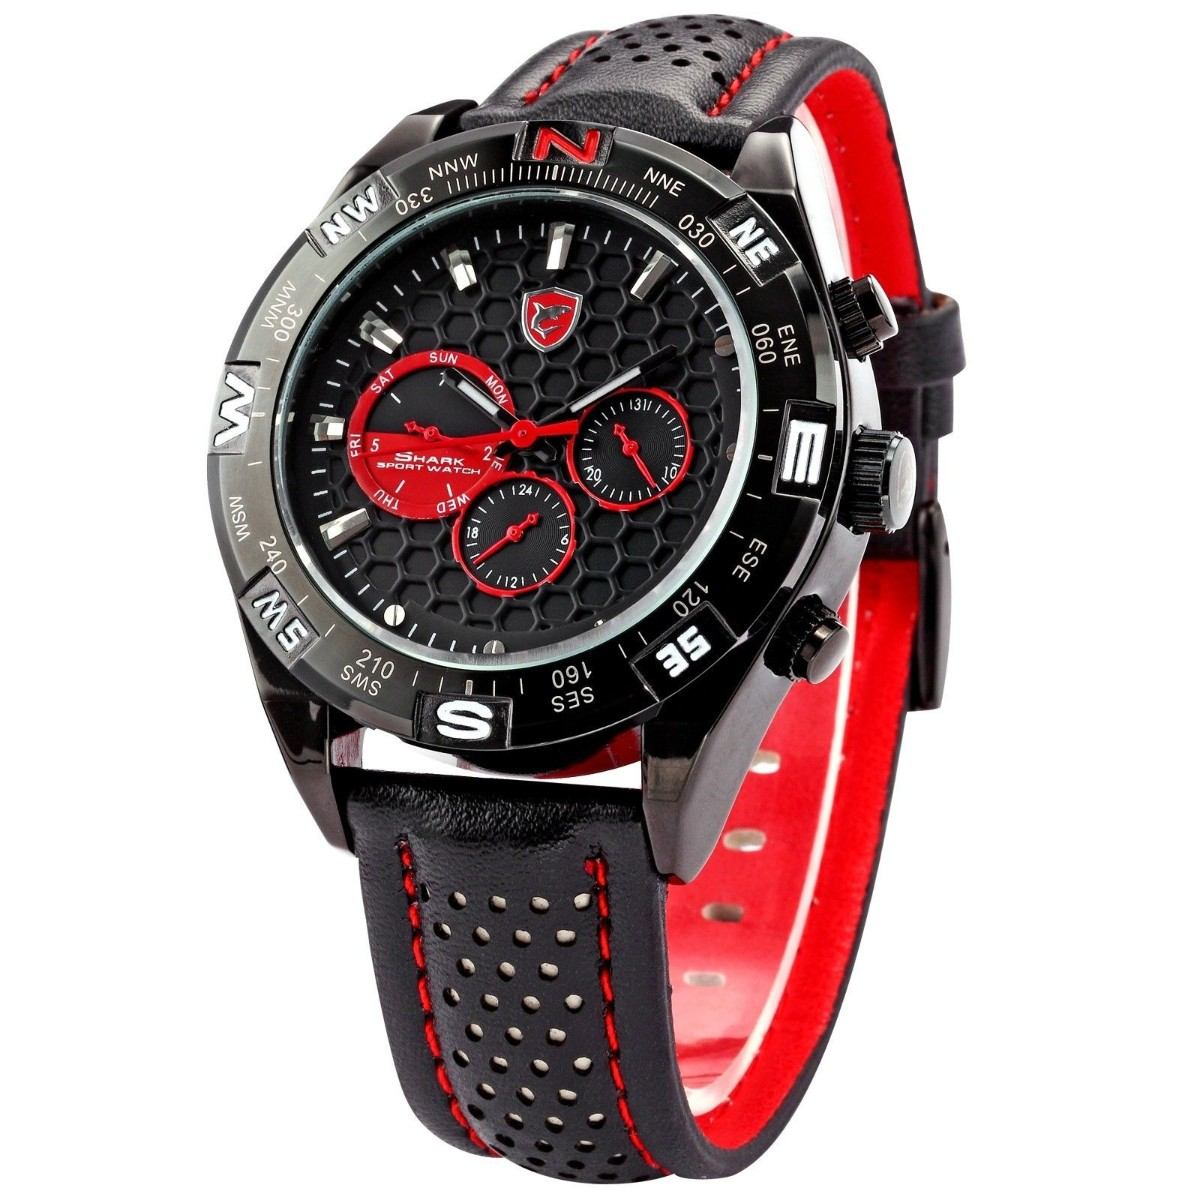 Reloj michael kors relojes pulsera otras marcas tattoo - Reloj adhesivo de pared ...